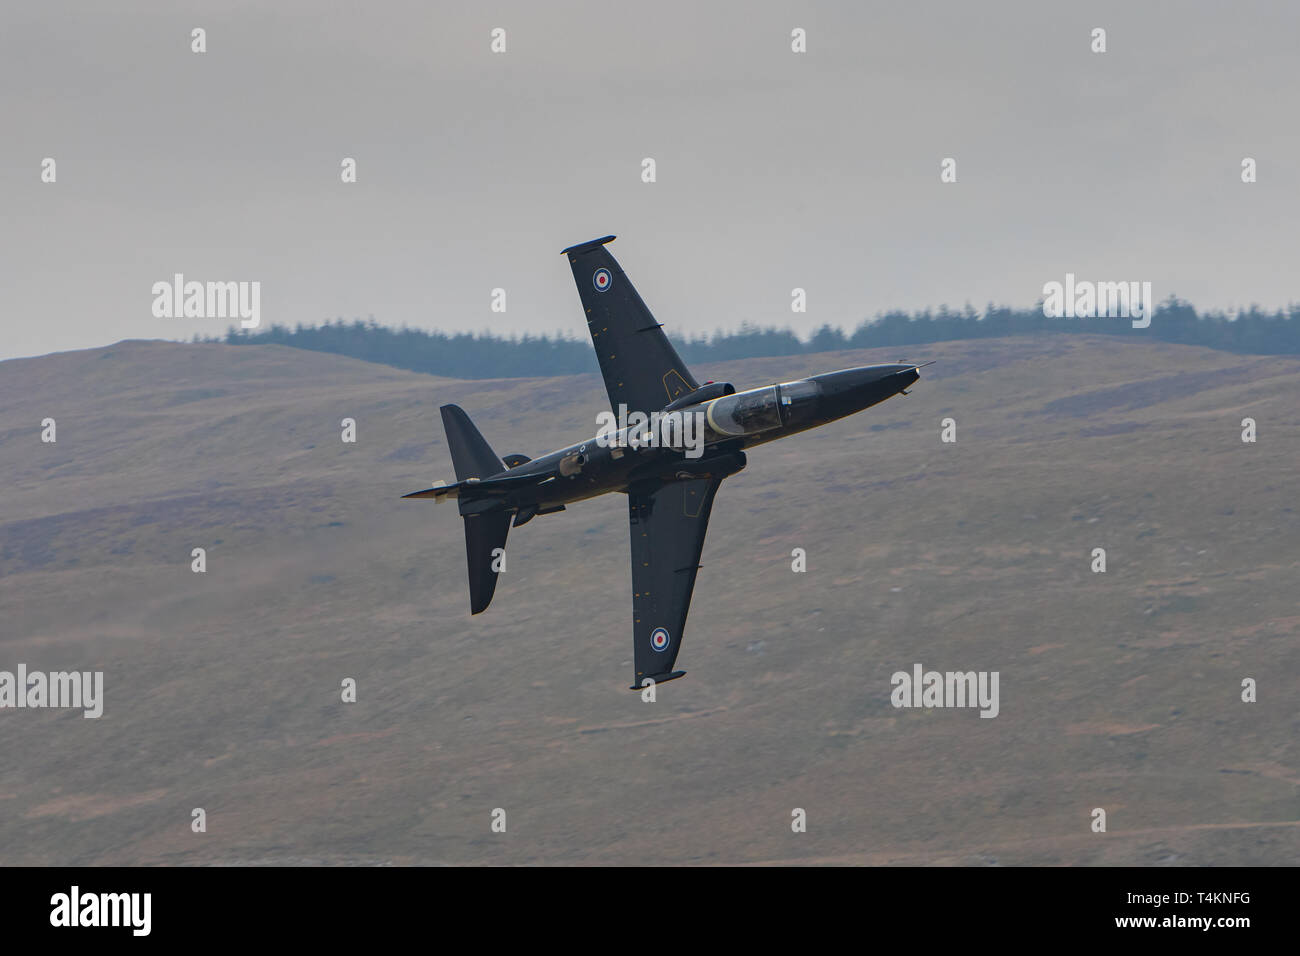 An RAF Hawk makes a training light through Mach Loop, Wales, UK. Stock Photo